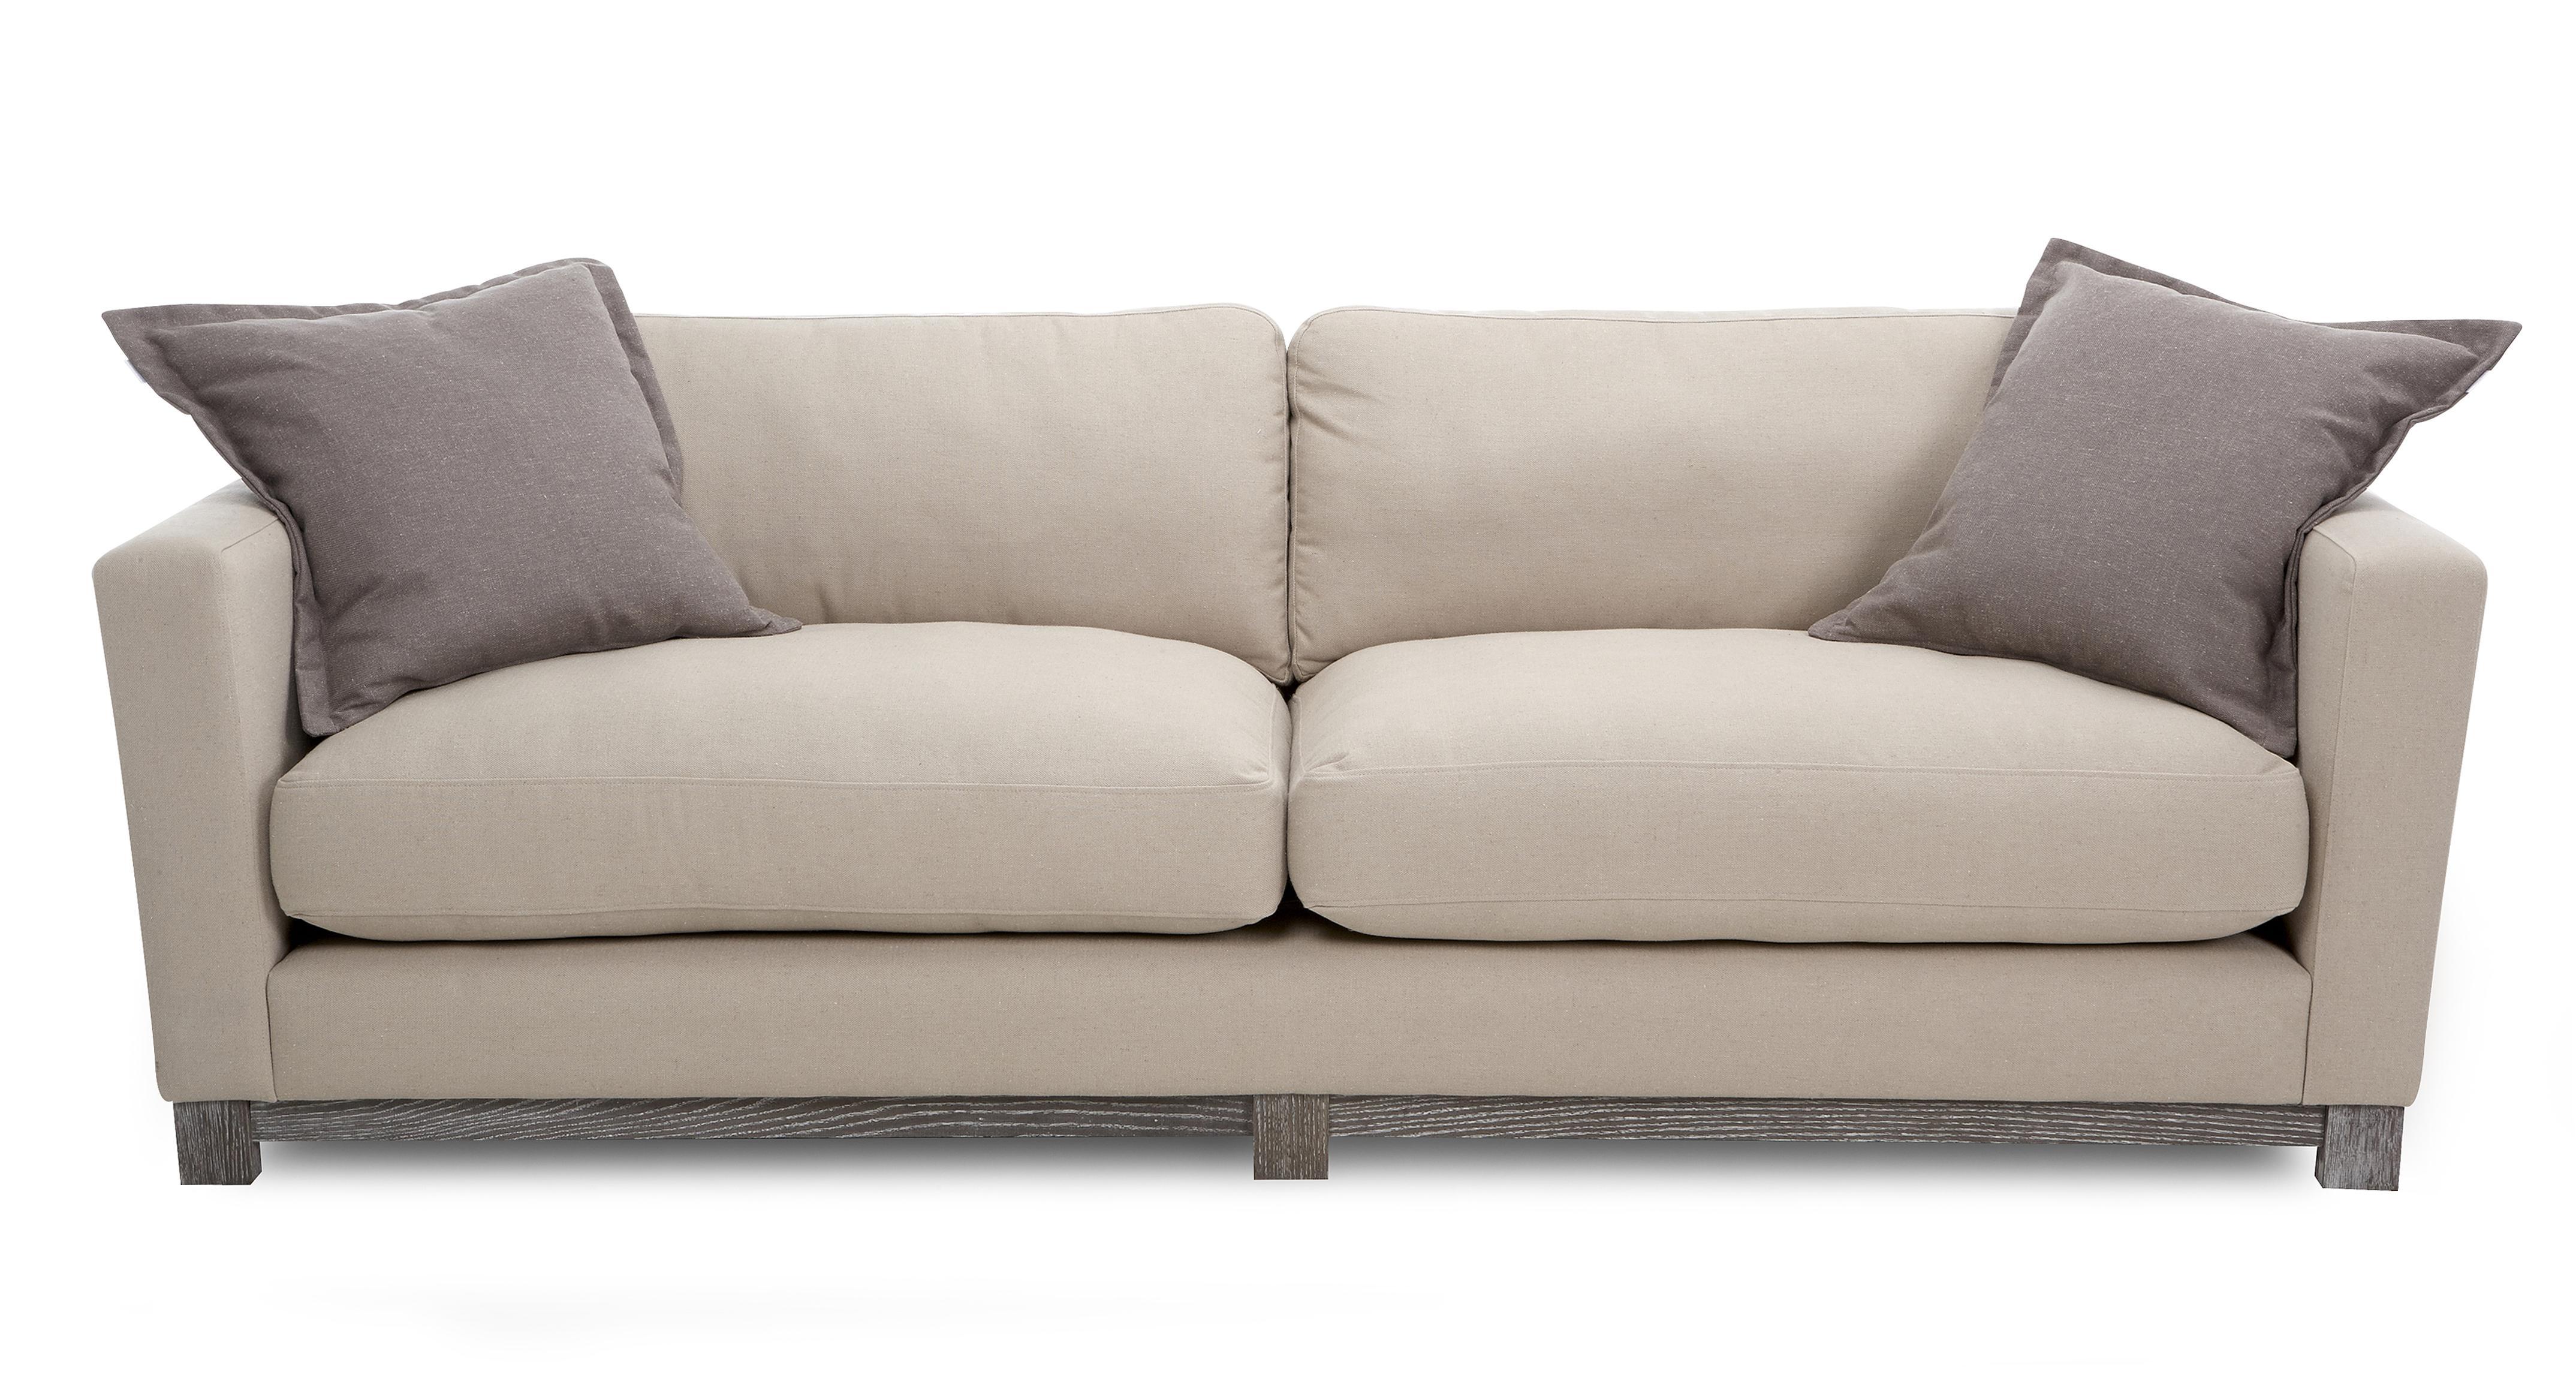 new sofas chalk 4 seater sofa new chalk | dfs ireland BKXYGKE